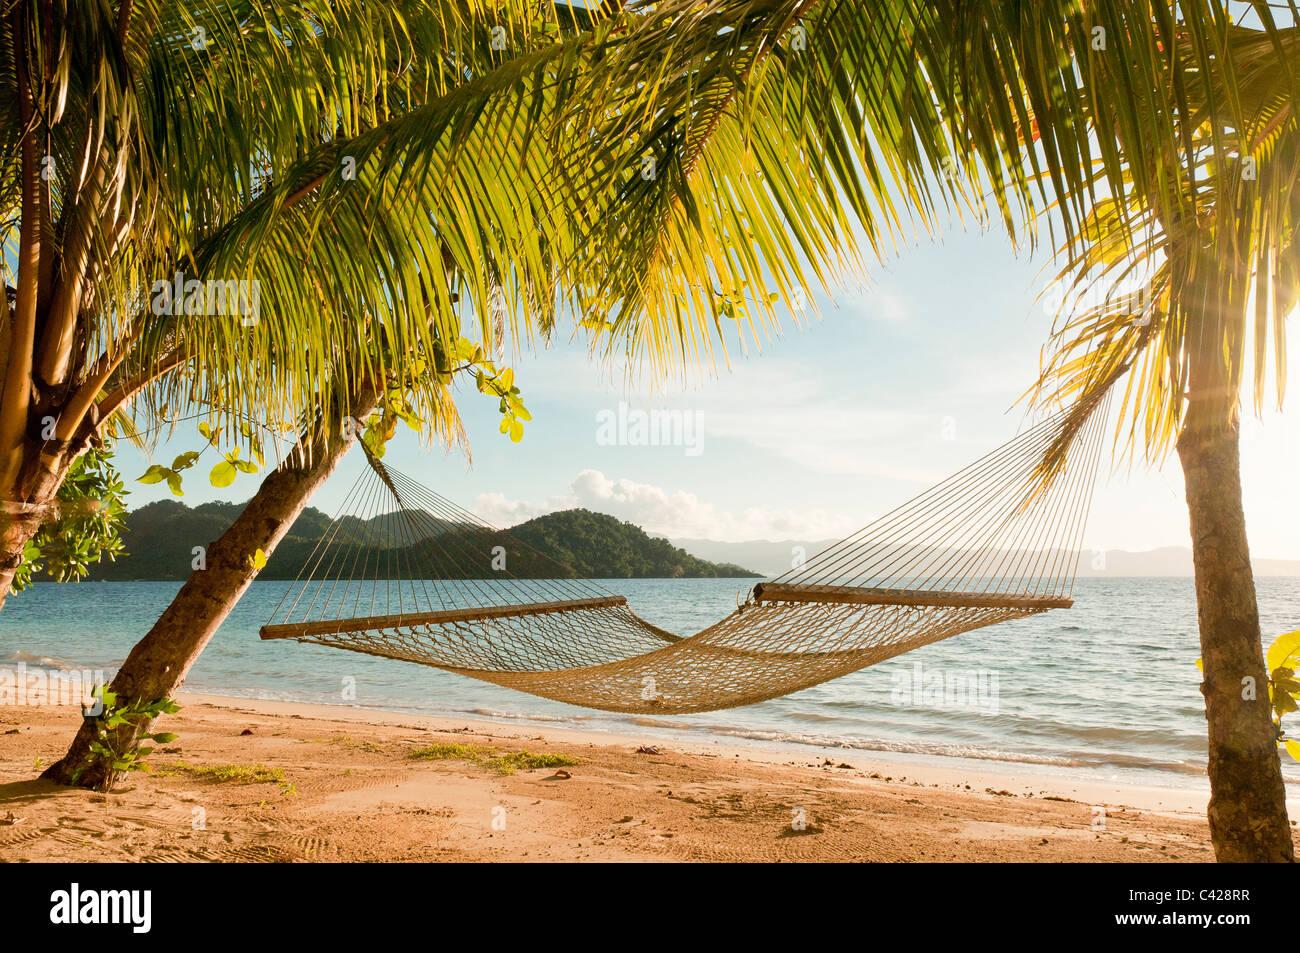 Hammock on beach at Matangi Private Island Resort, Fiji. - Stock Image